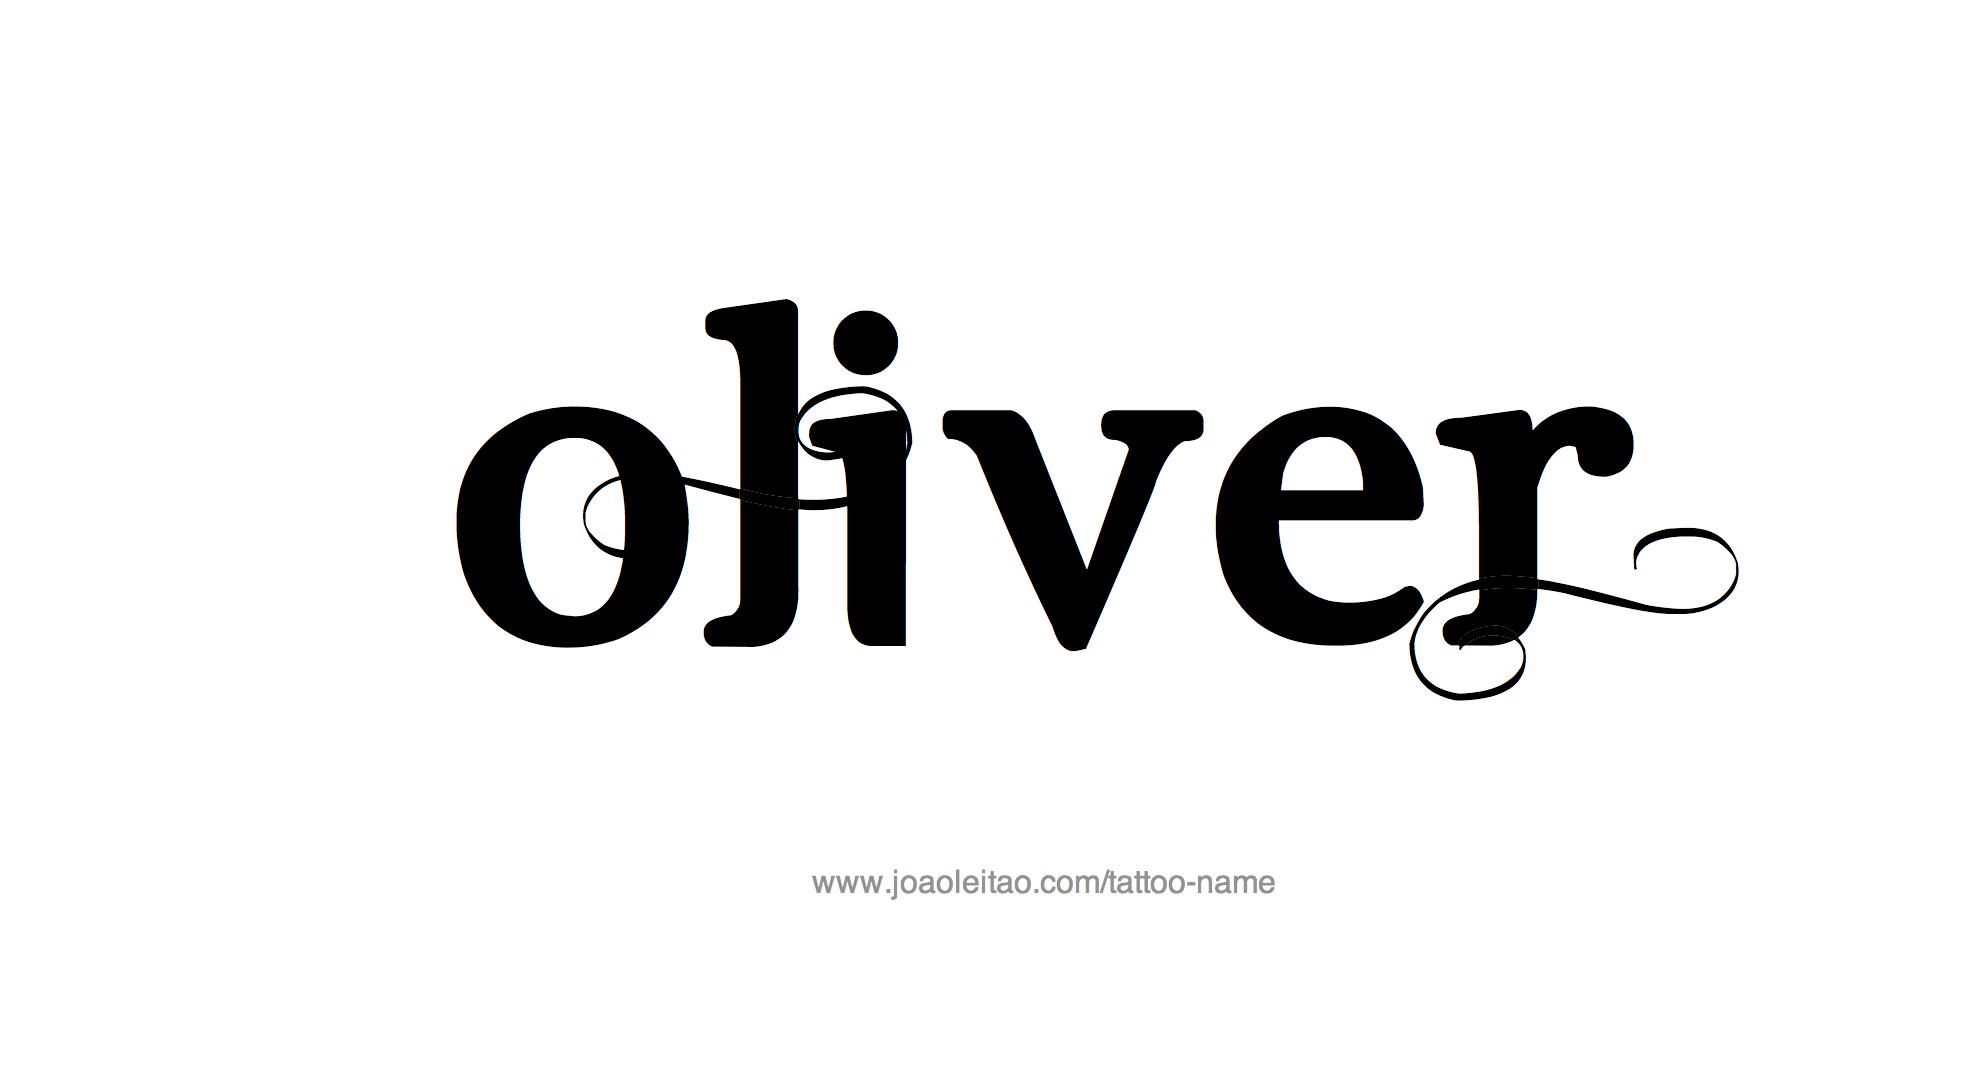 Name: Oliver Name Tattoo Designs